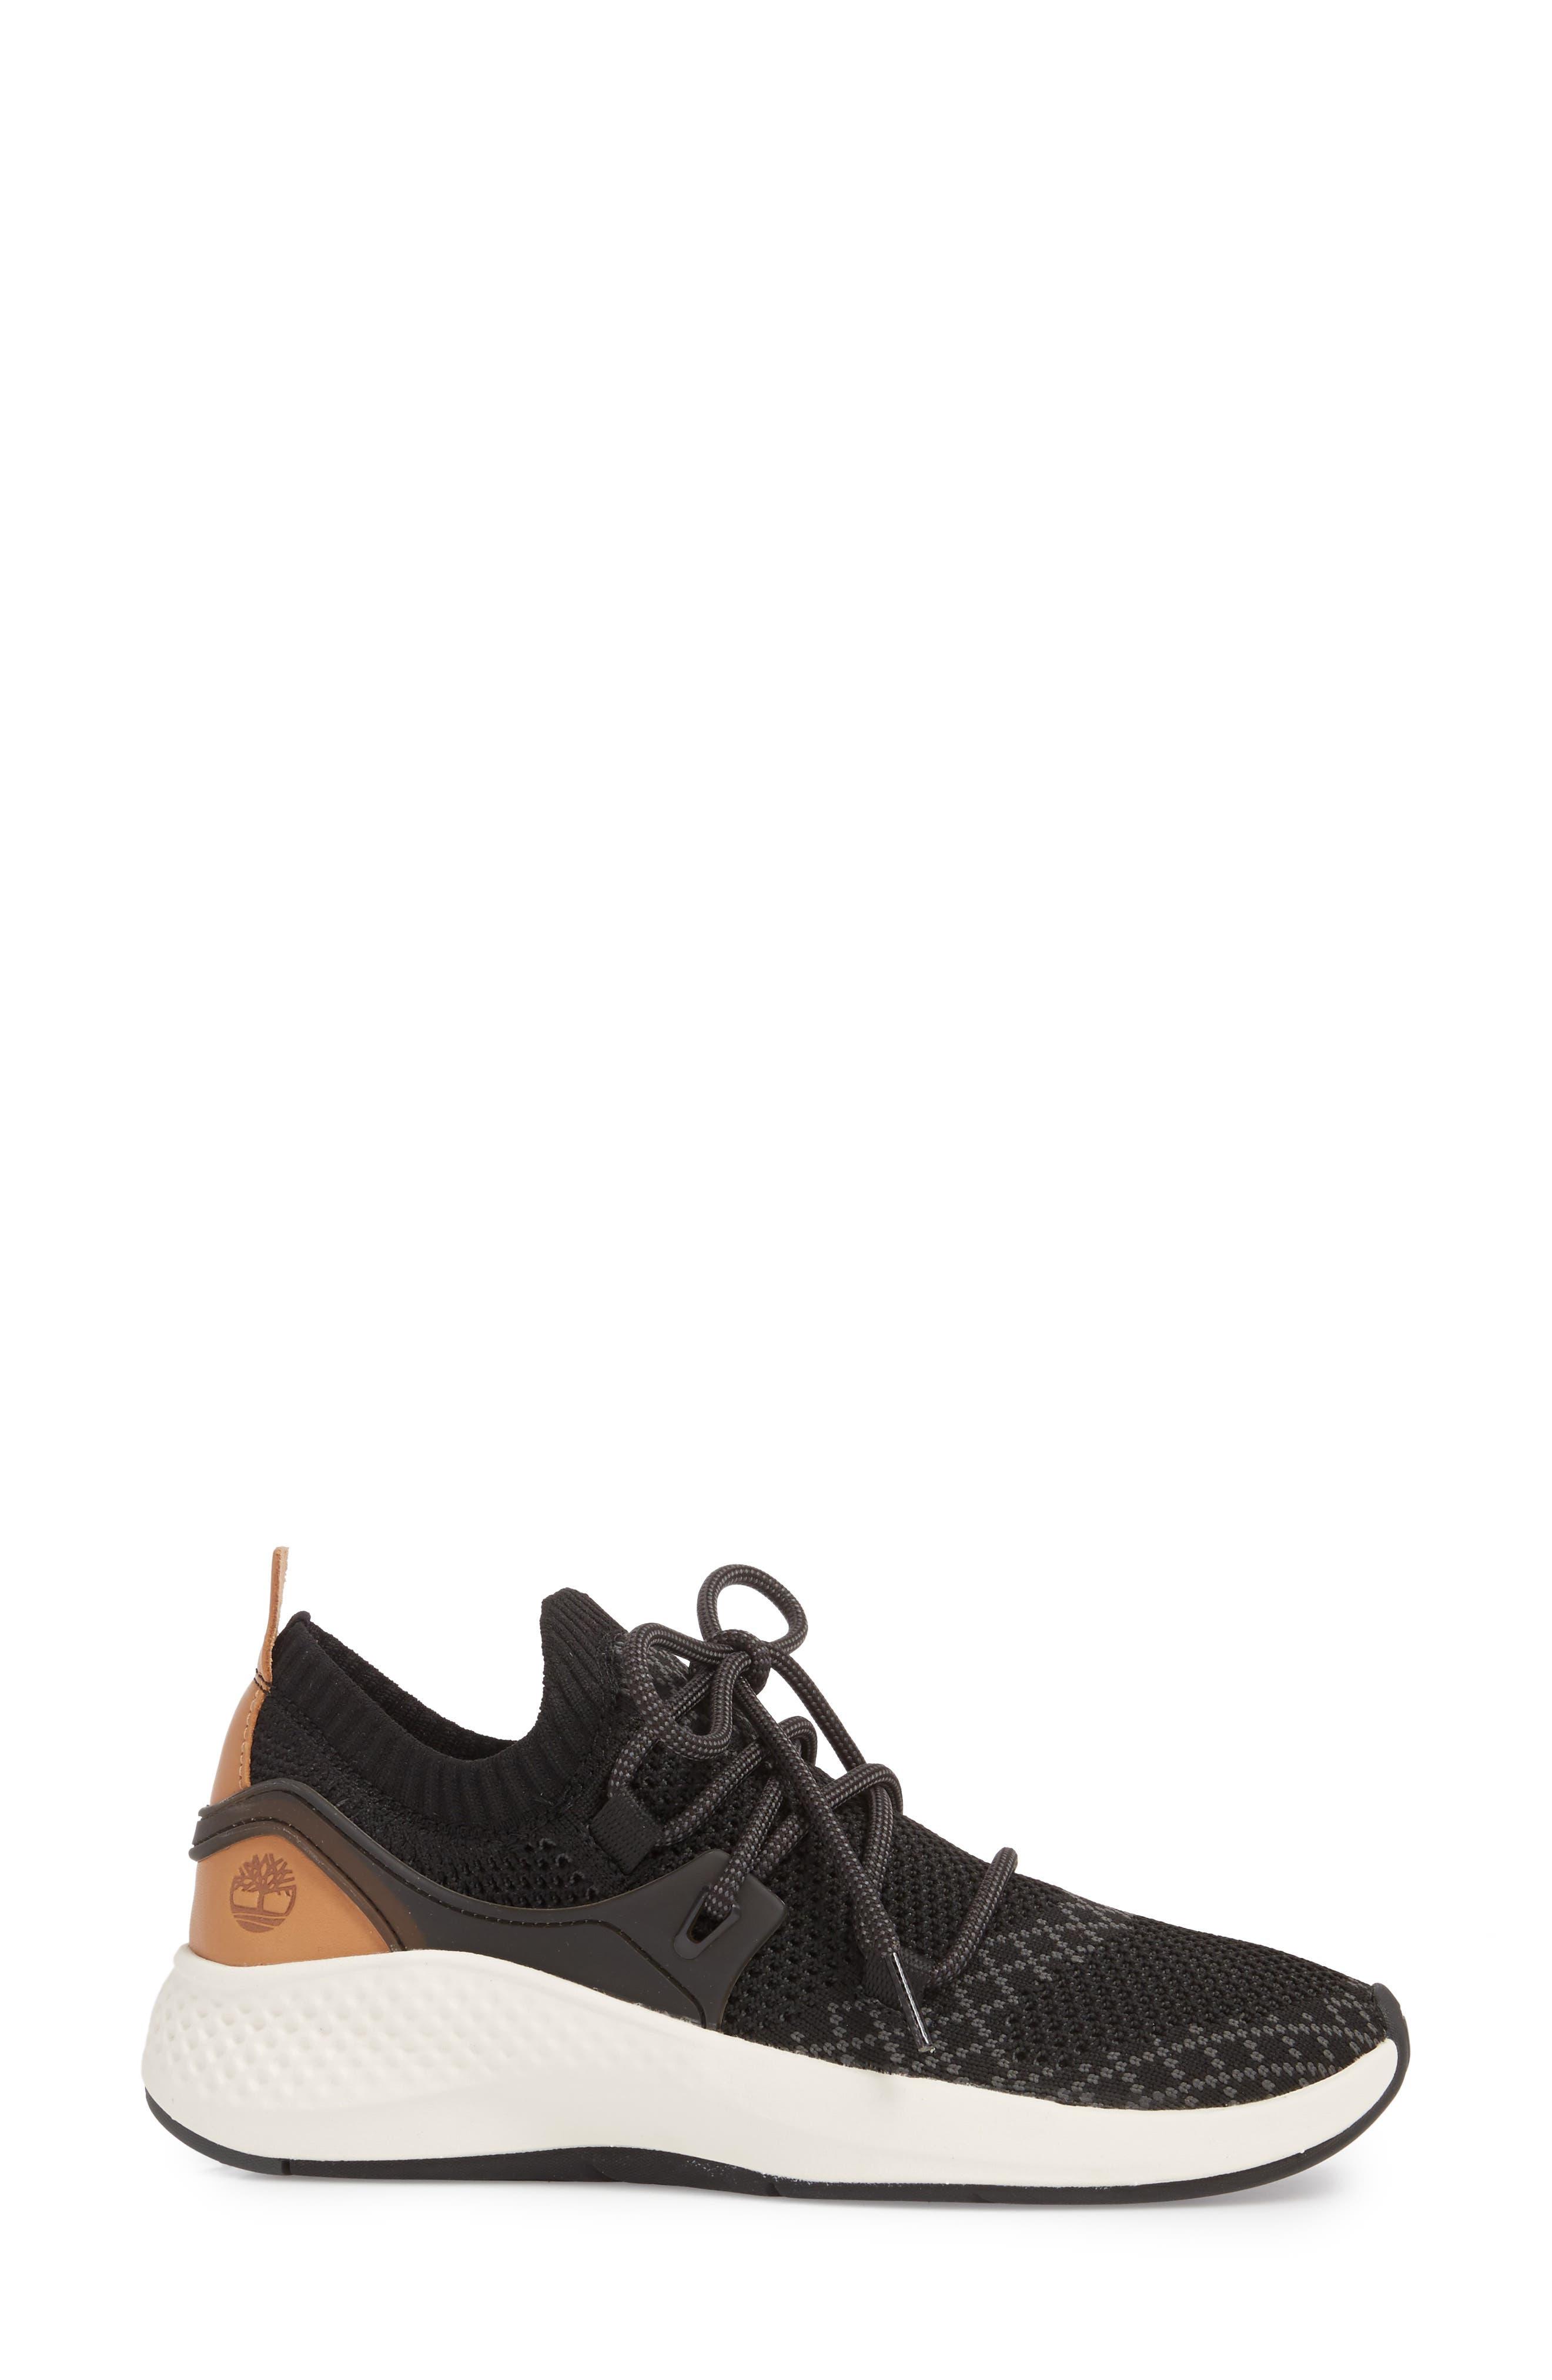 TIMBERLAND,                             FlyRoam Go Knit Sneaker,                             Alternate thumbnail 3, color,                             001